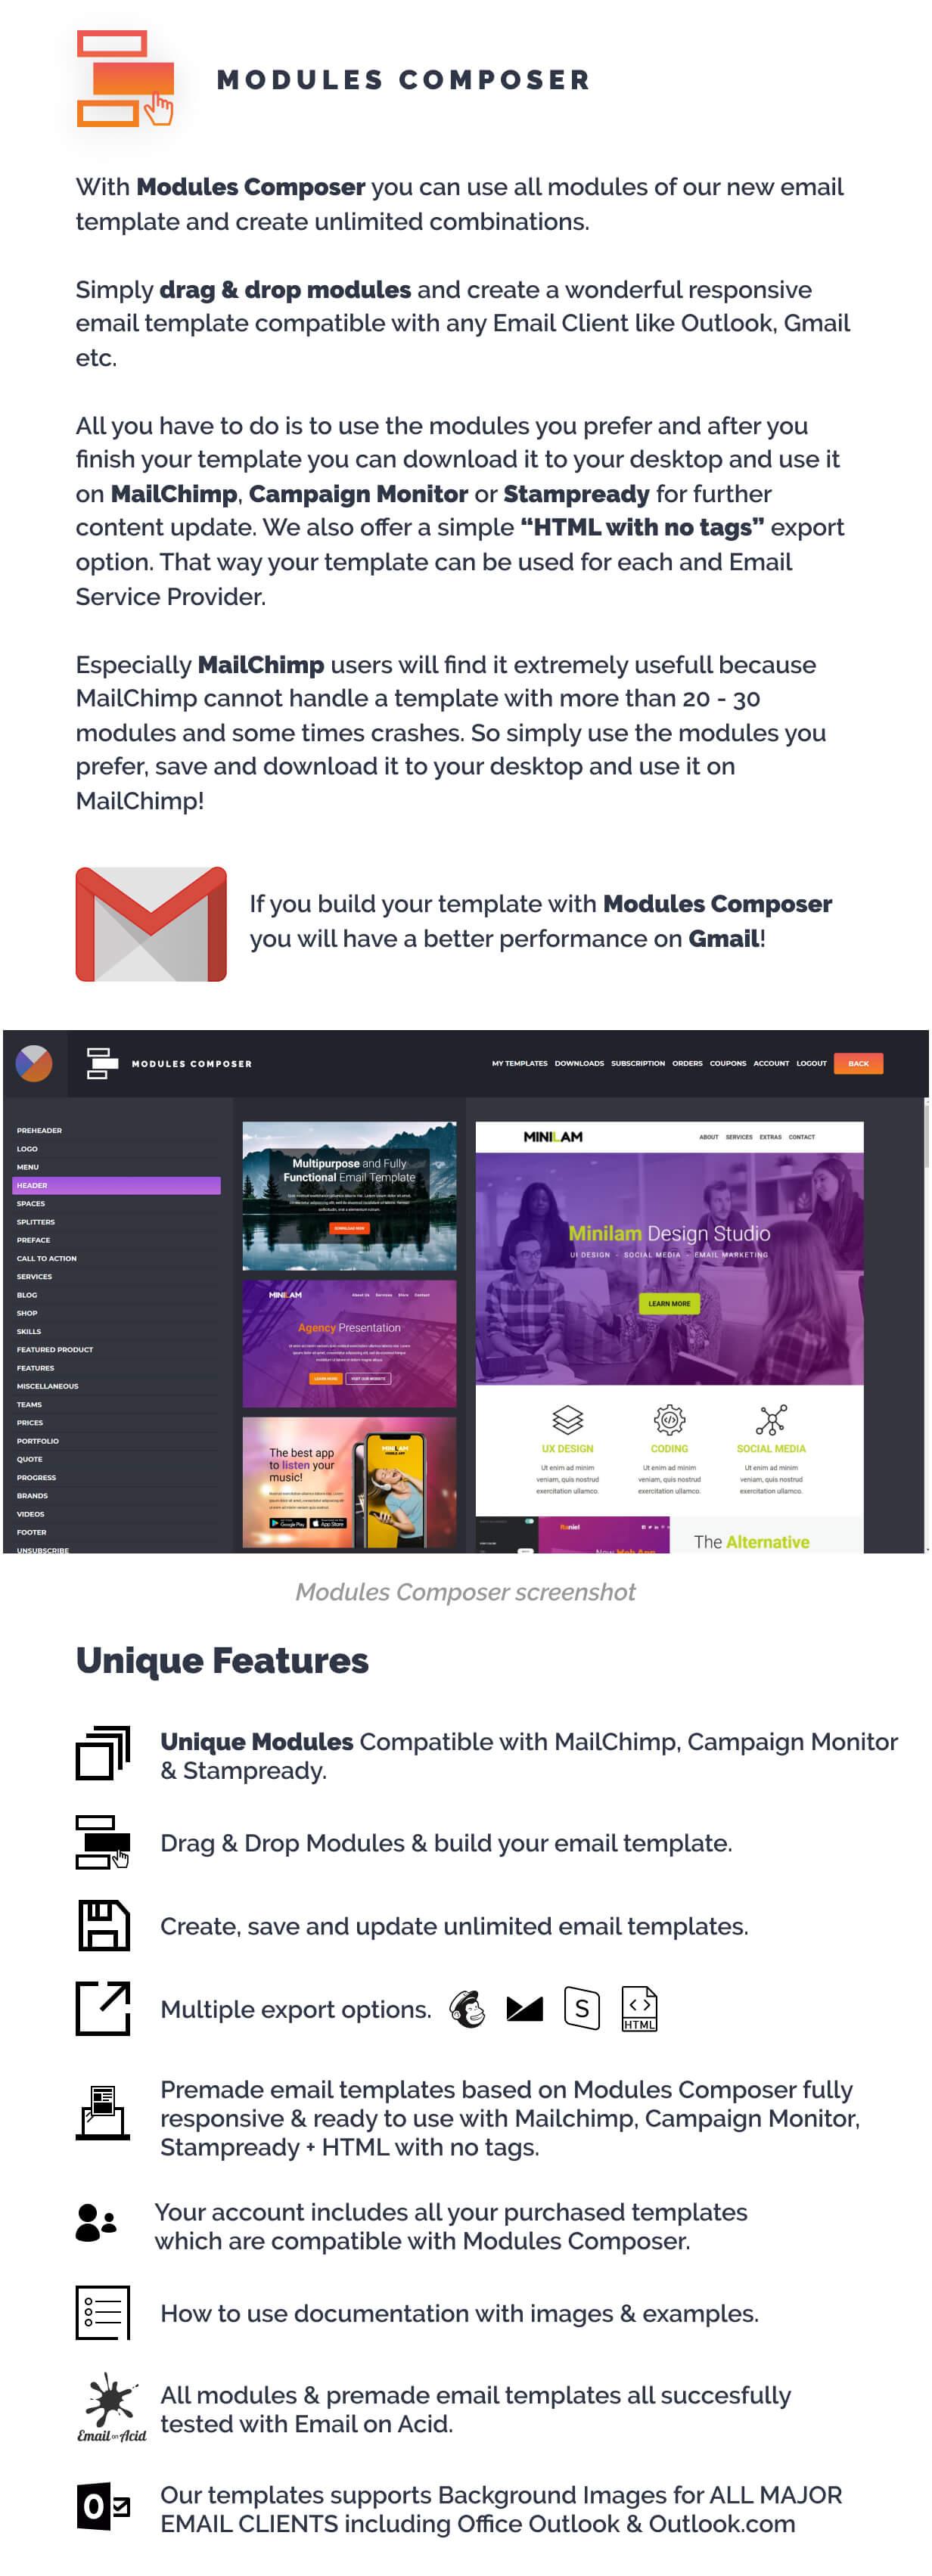 modules-composer